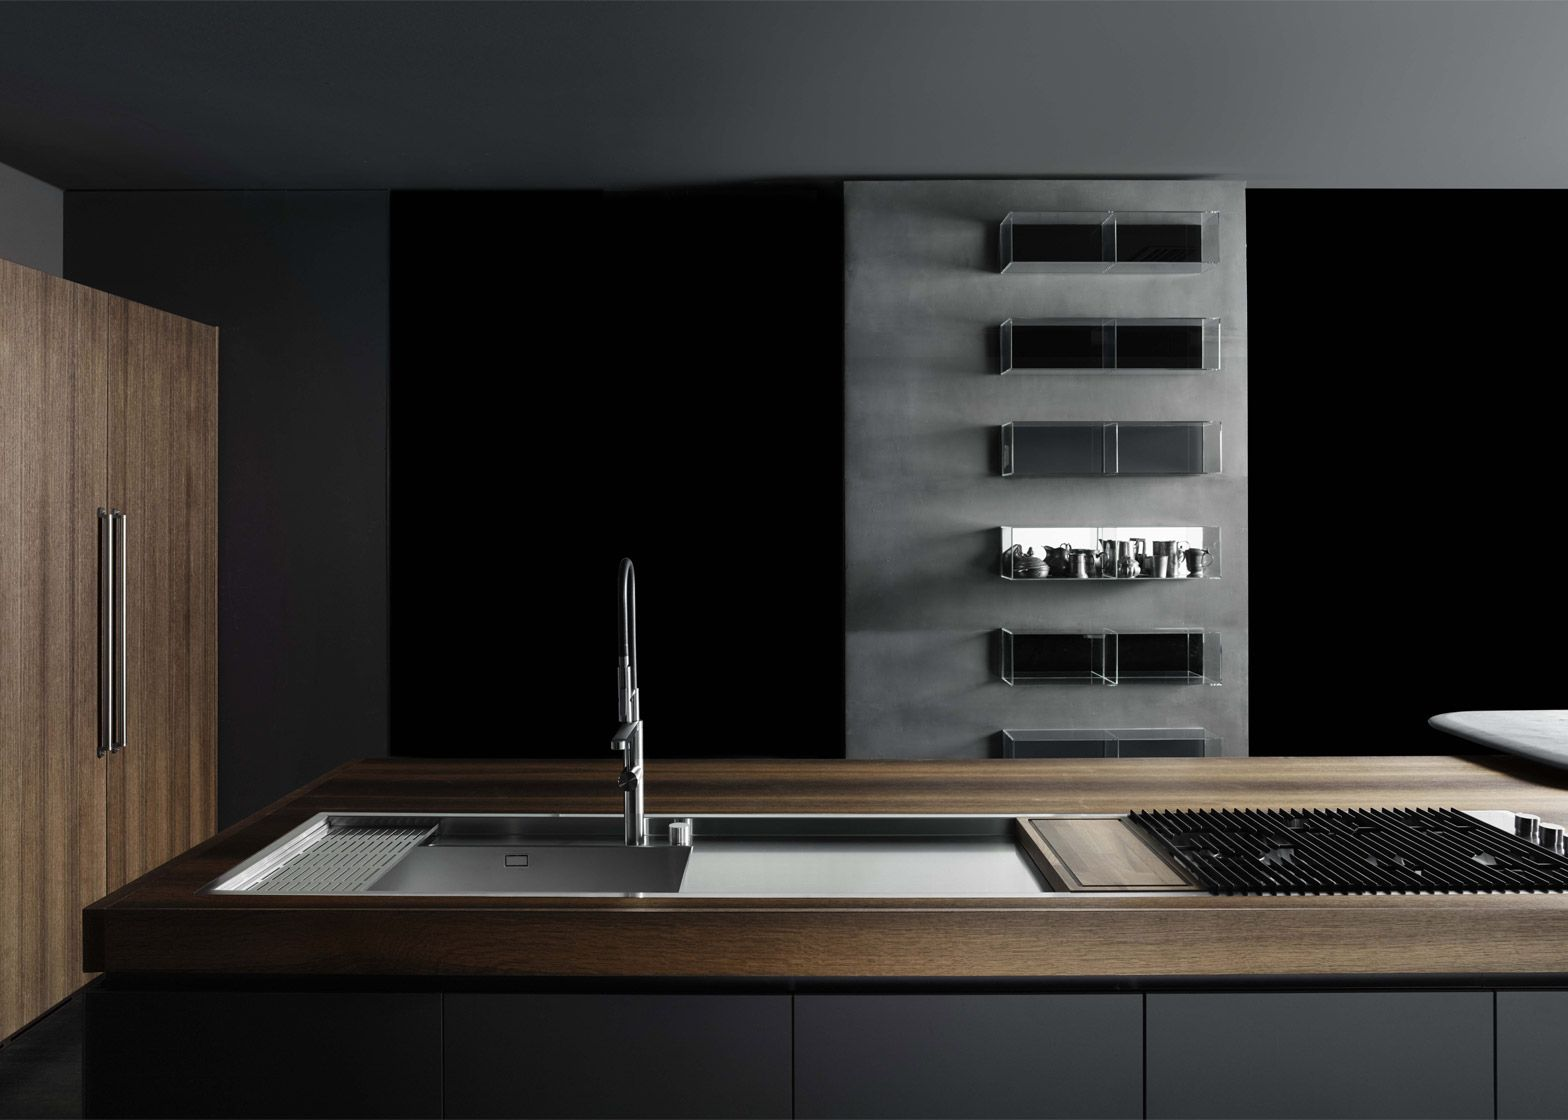 Italian architect Piero Lissoni has designed a series of customisable kitchens, bathroom and ...